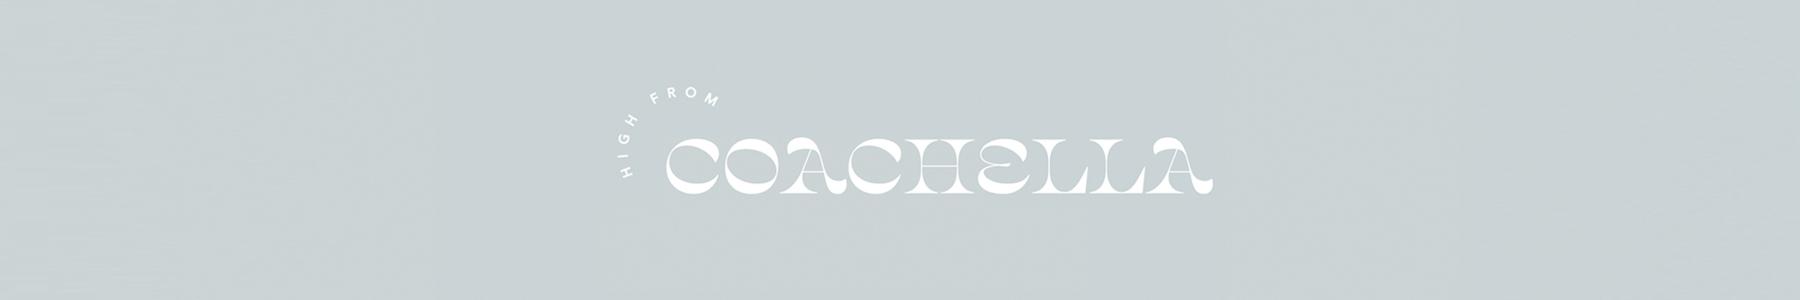 https://www.lighthousedispensary.com/wp-content/uploads/2020/08/coachella_banner_small.jpg